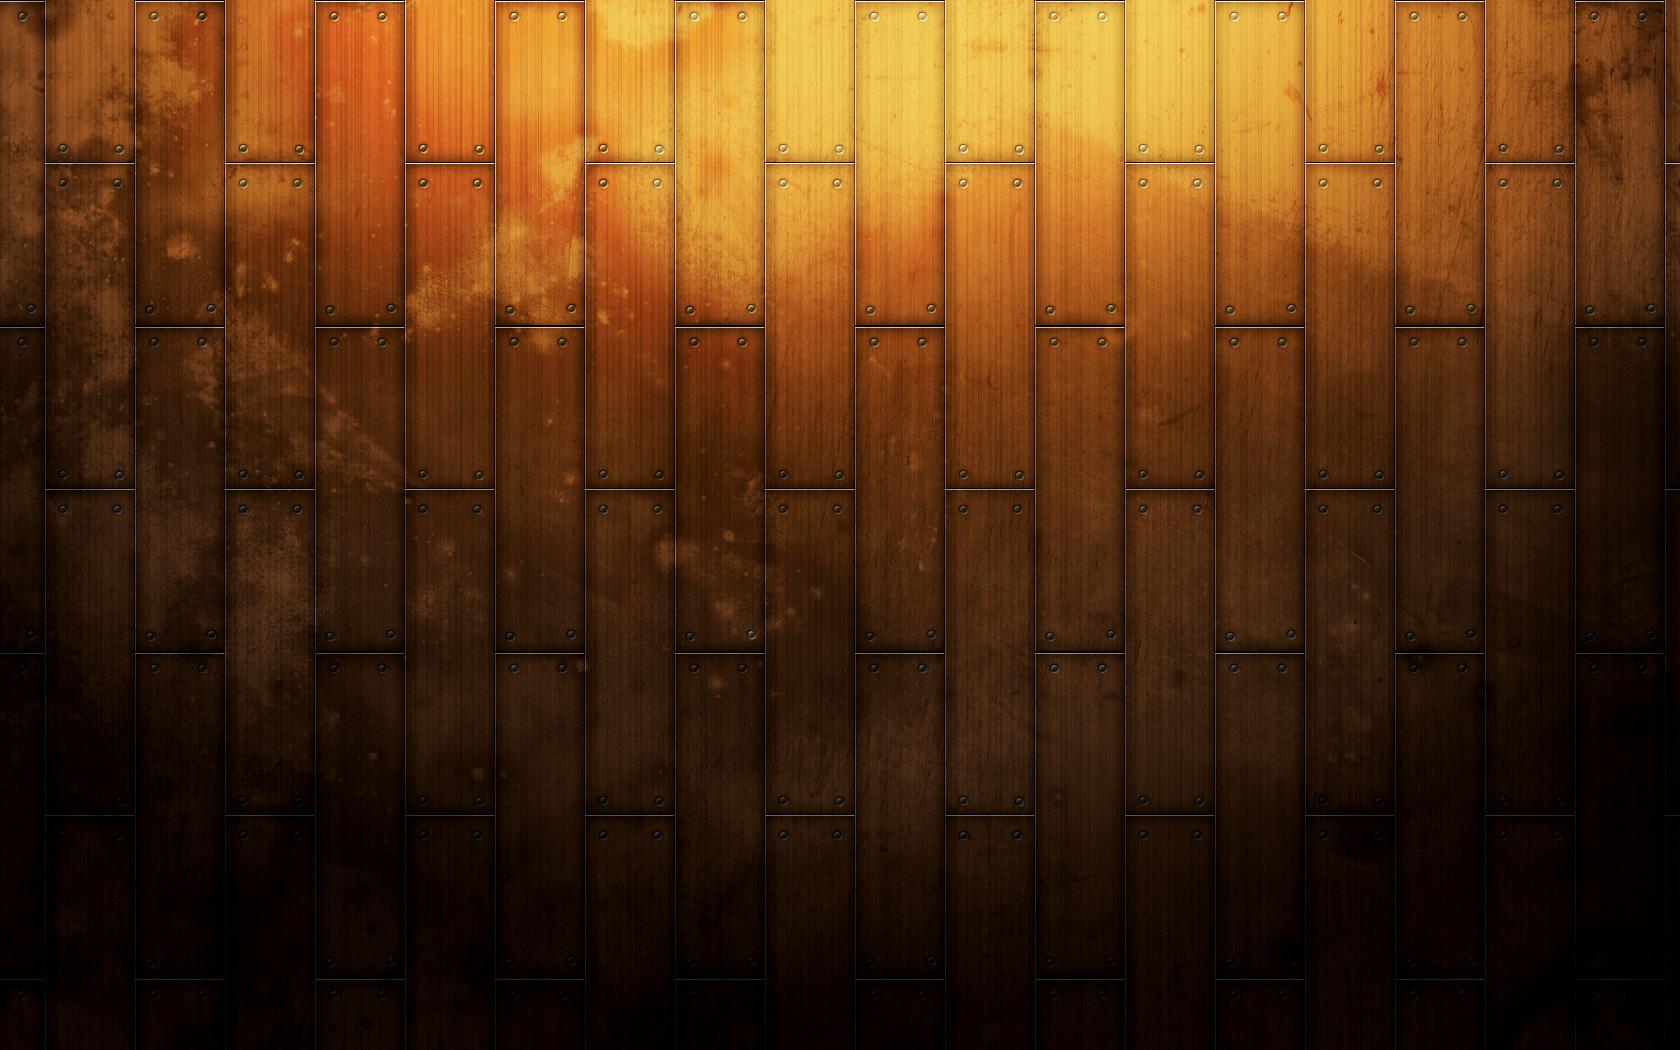 desktop wallpaper background for your website or whatever else 1680x1050